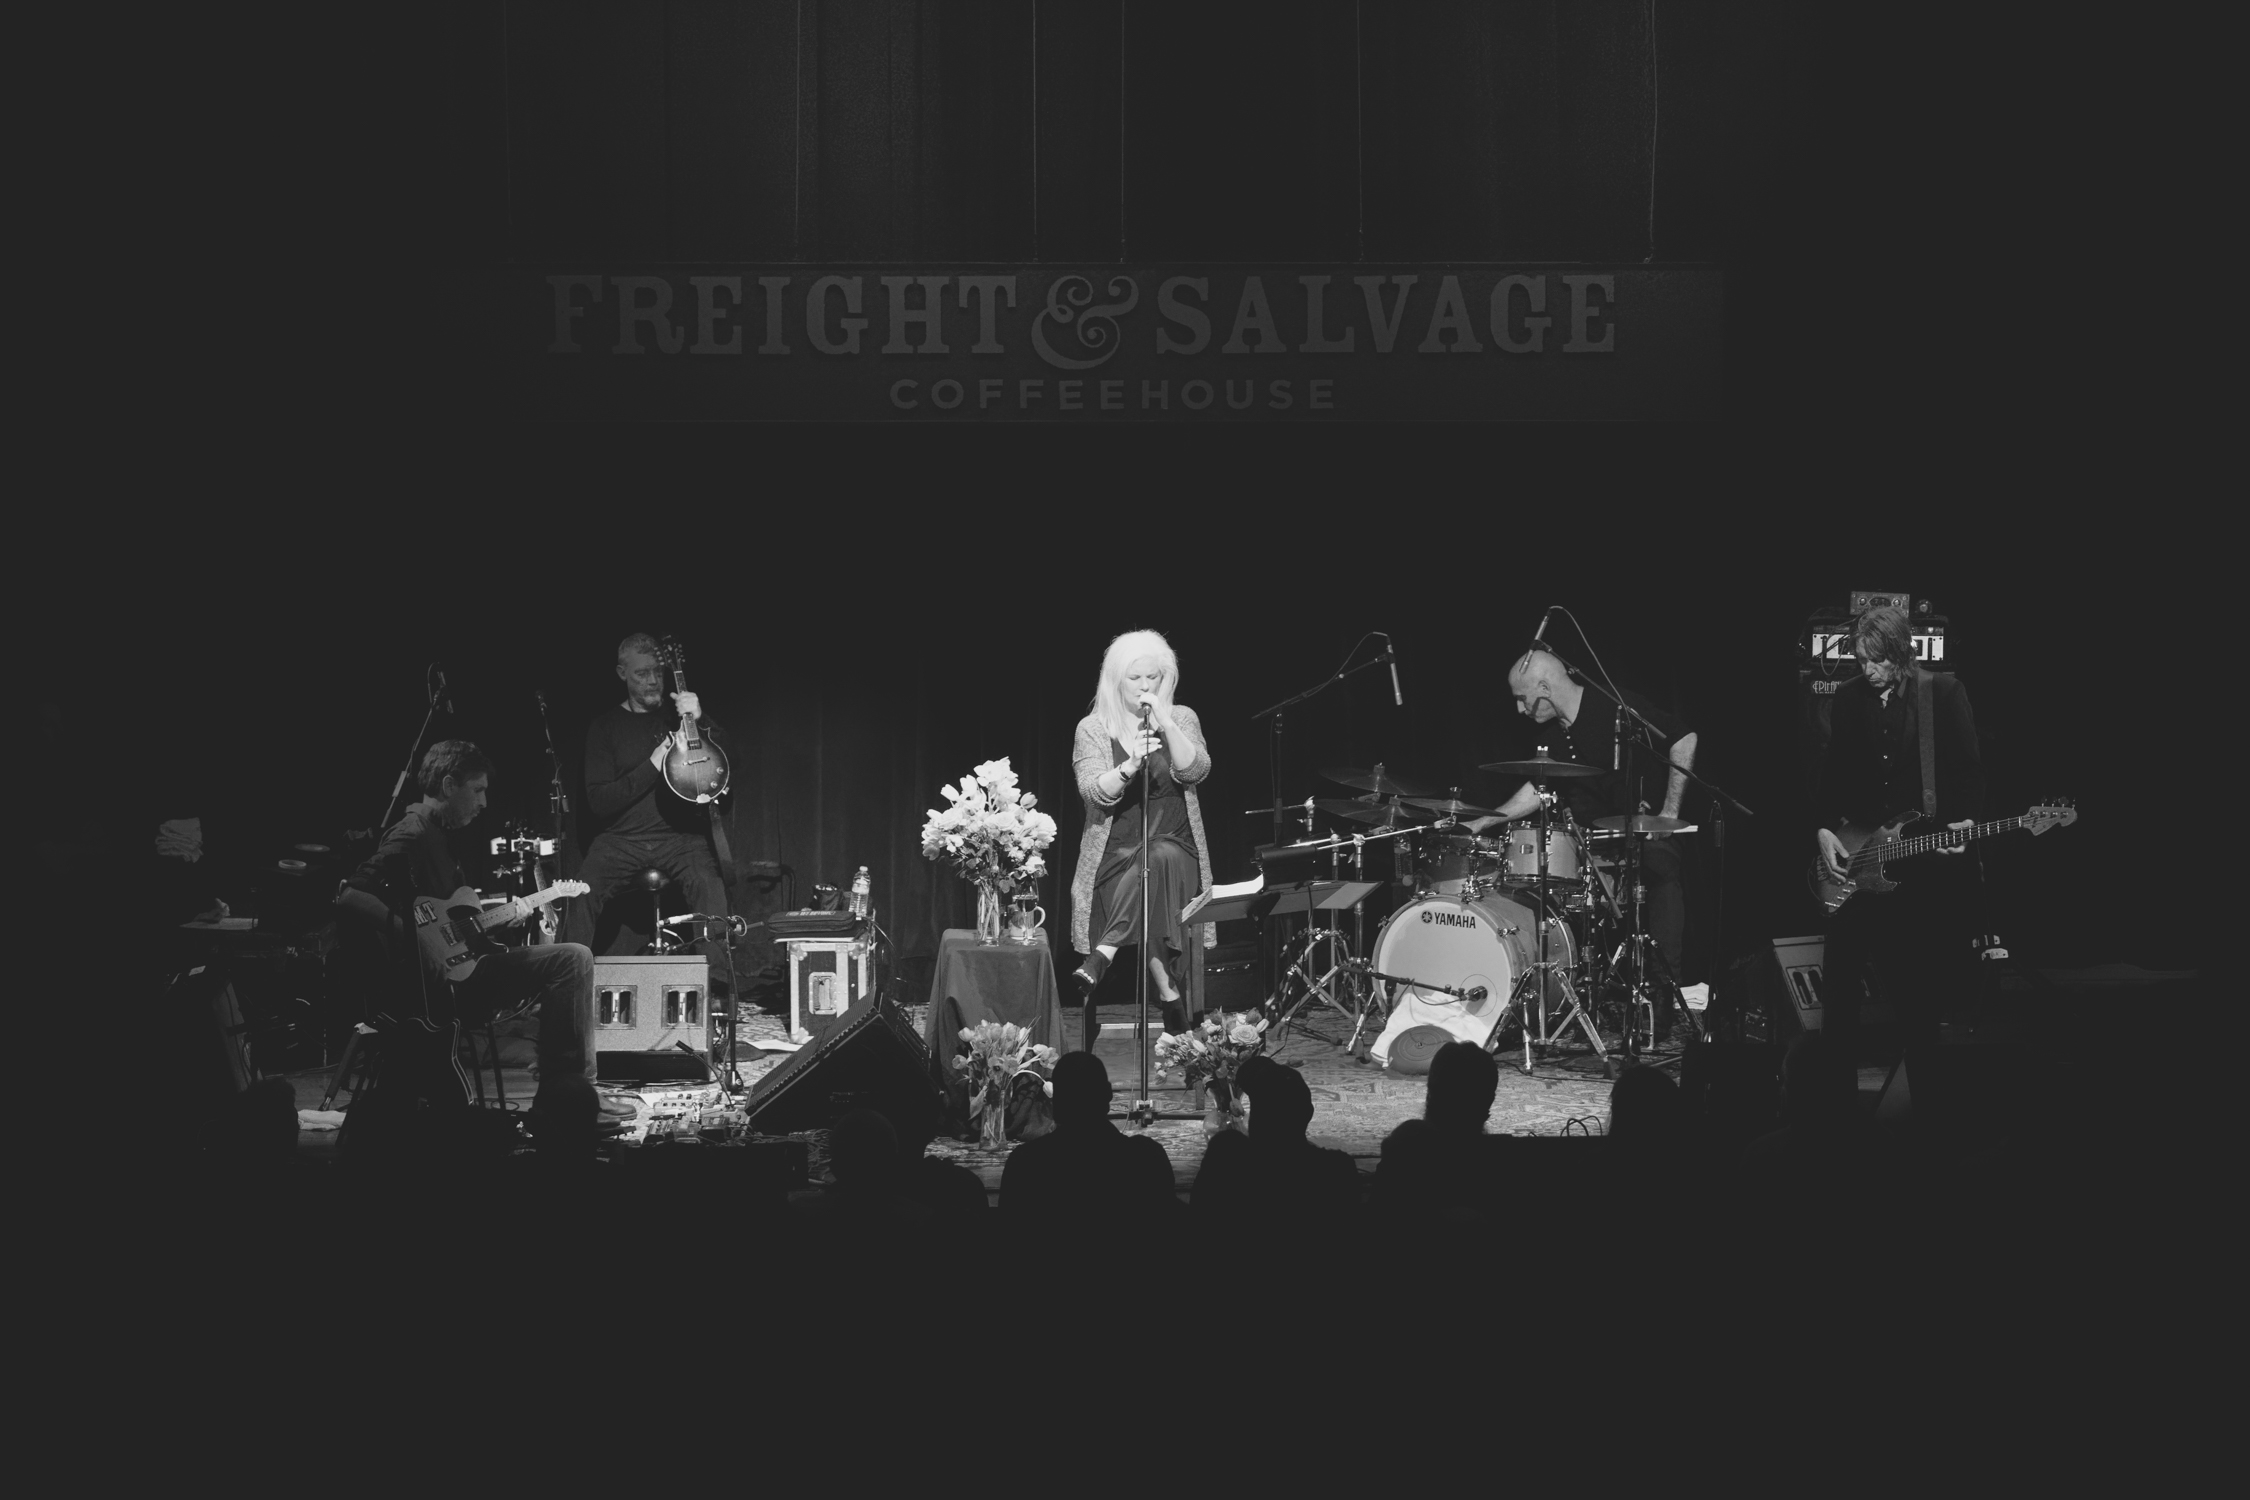 20190512 019 Freight & Salvage - Cowboy Junkies - by Jon Bauer.jpg